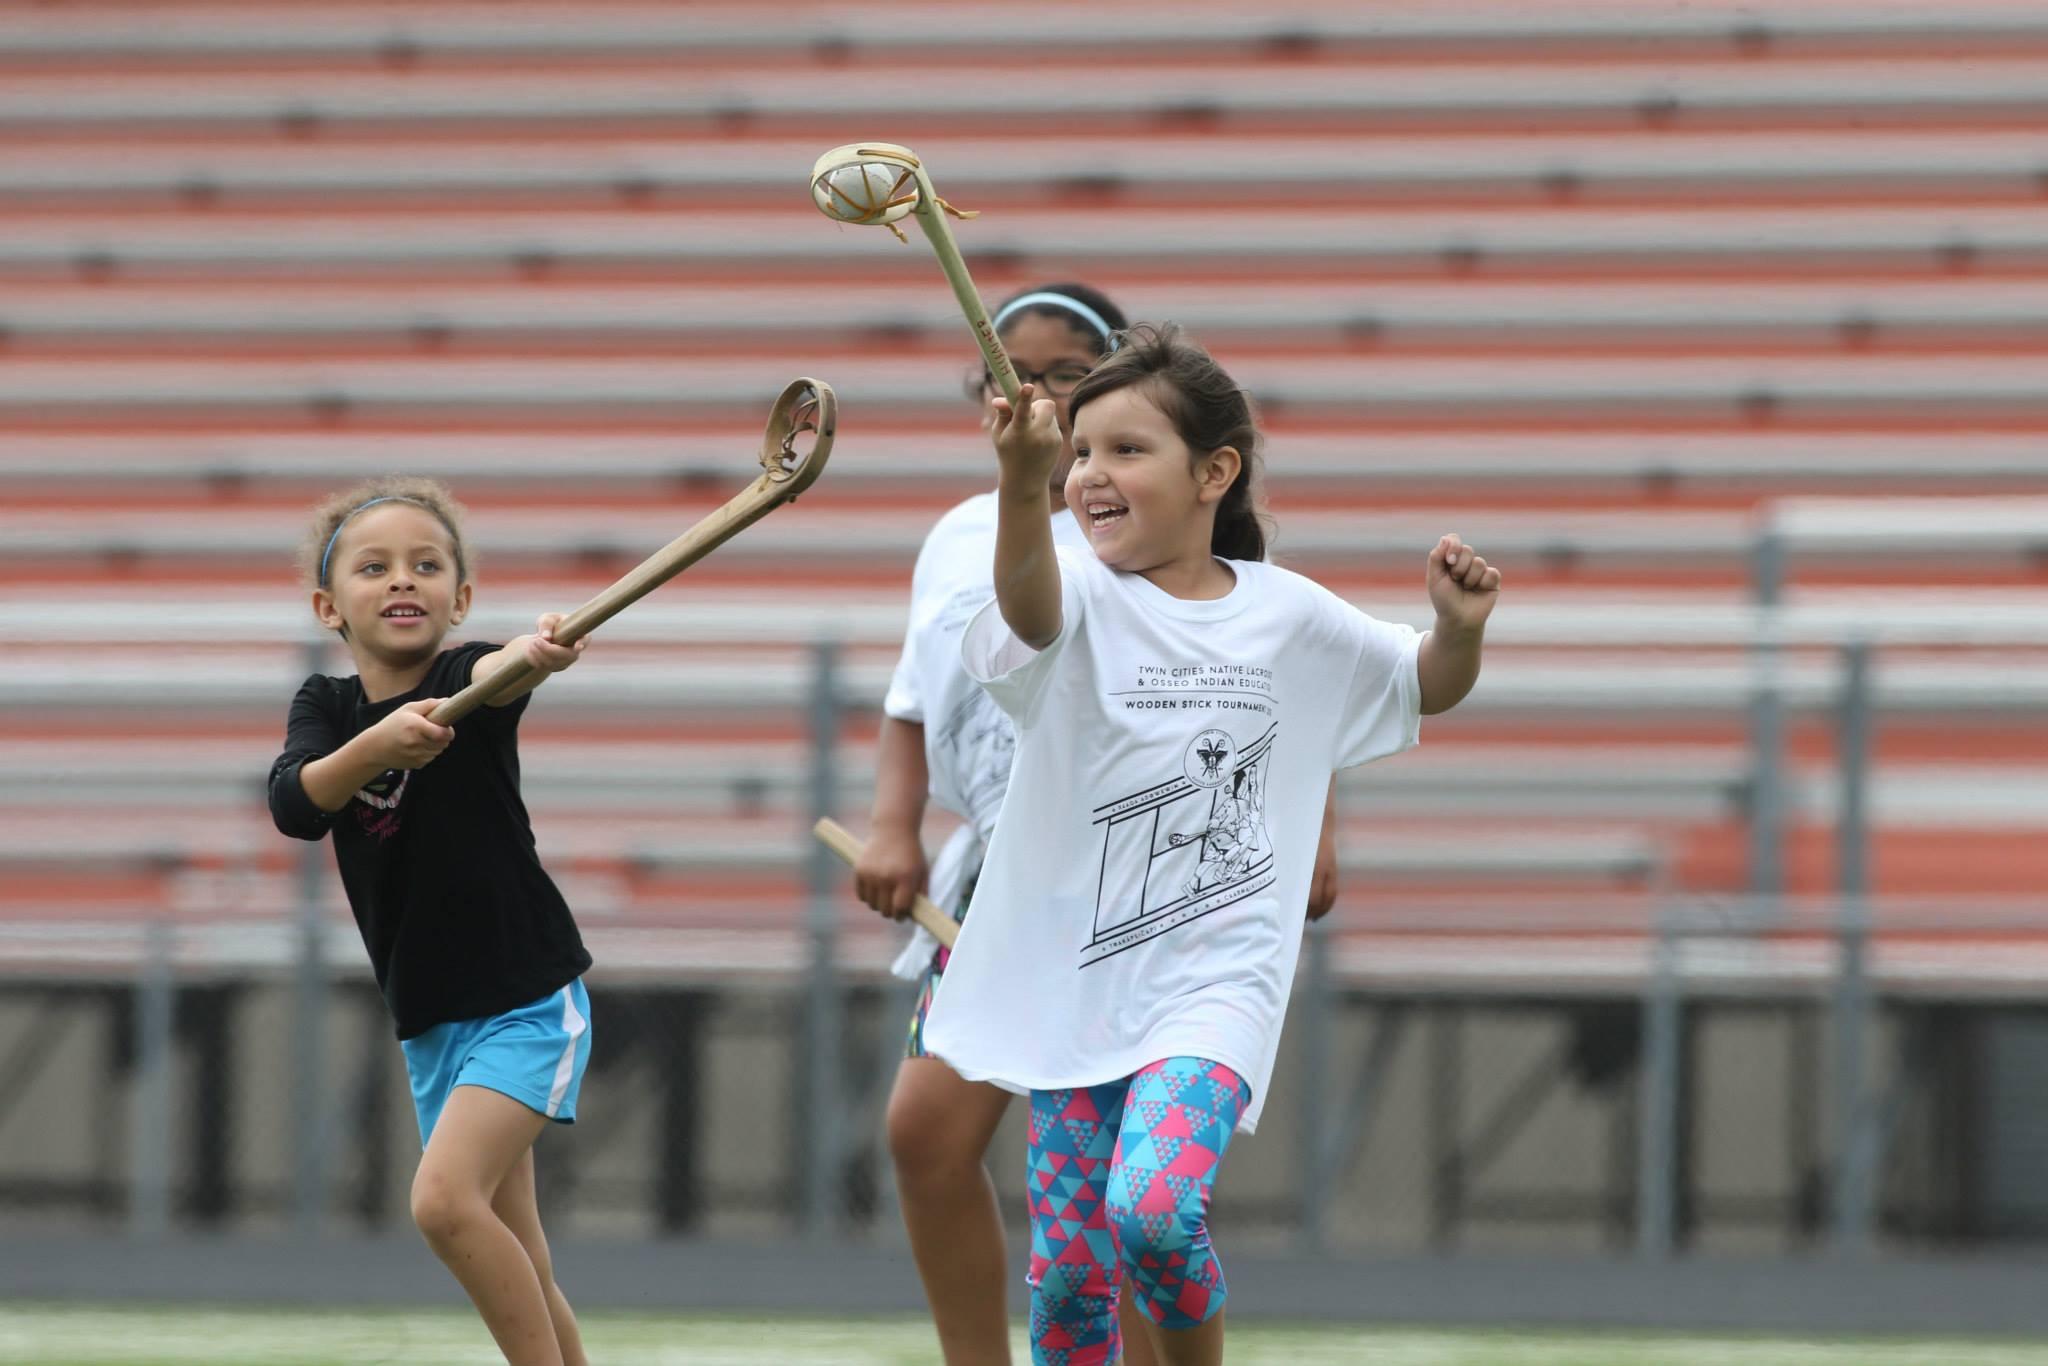 Twin Cities Native Lacrosse girls team members Stella Hunter and Riley Taylor. Photo: David Joles.